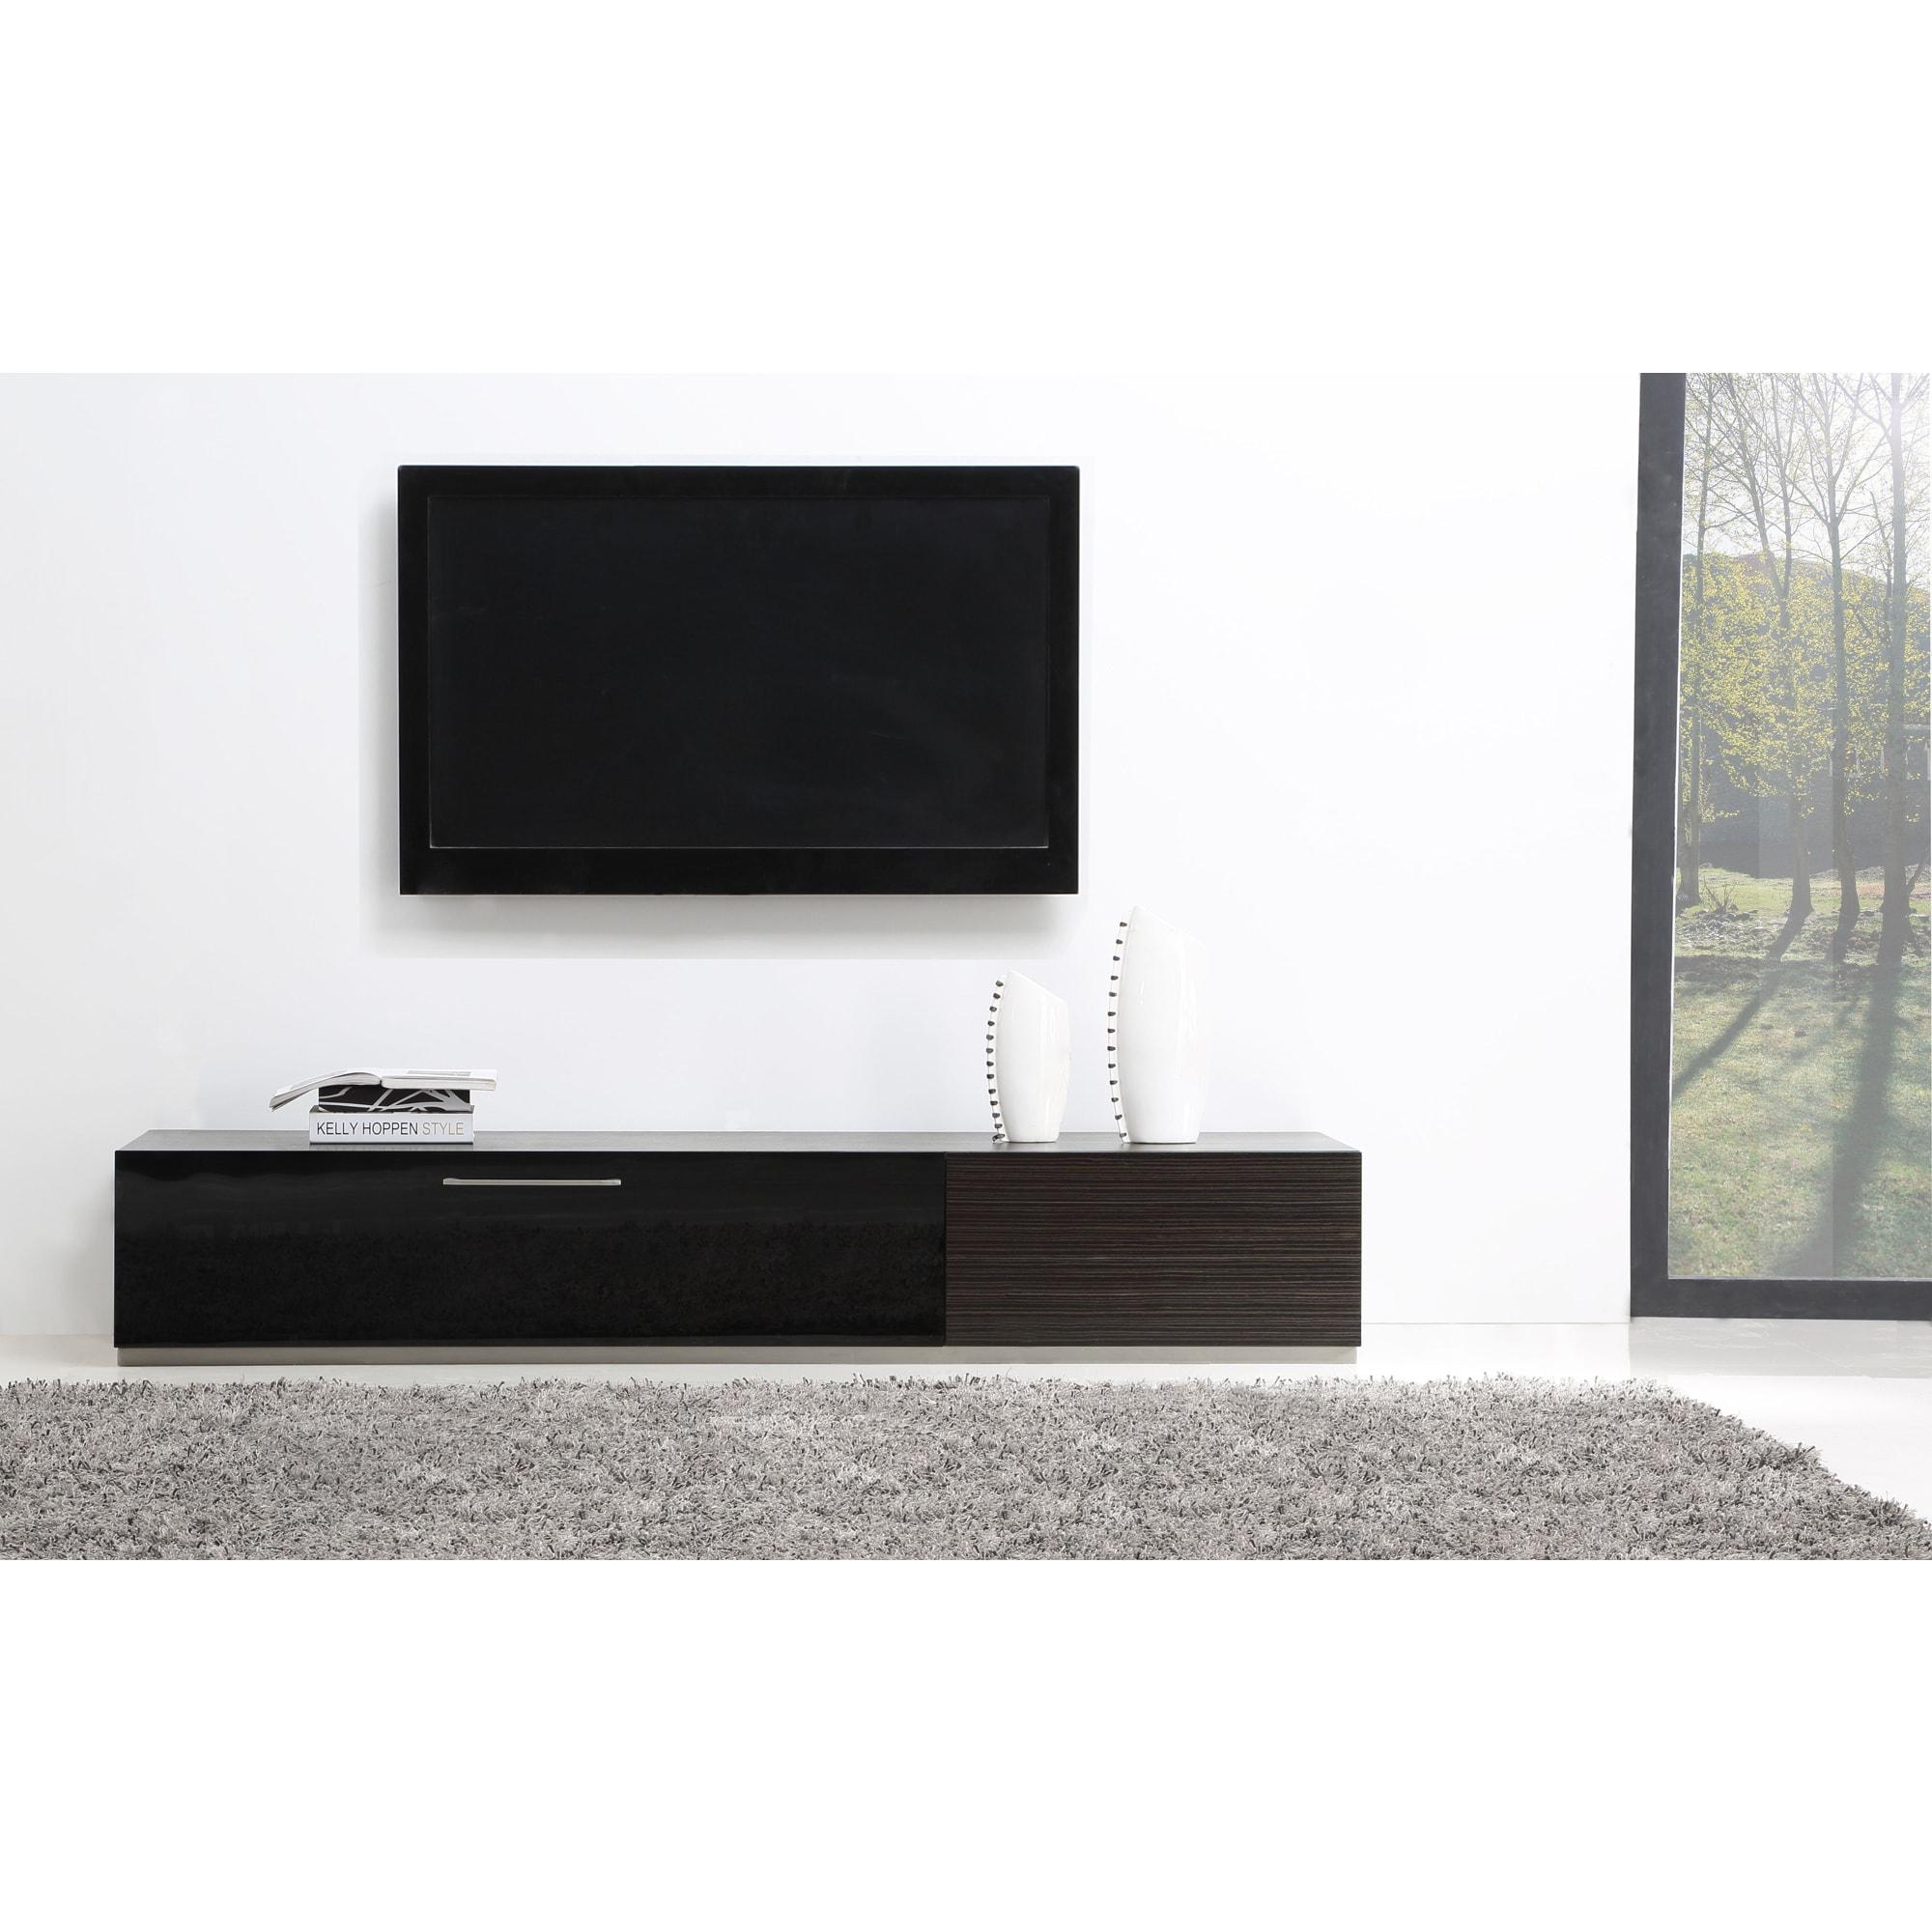 Ebony tv stand